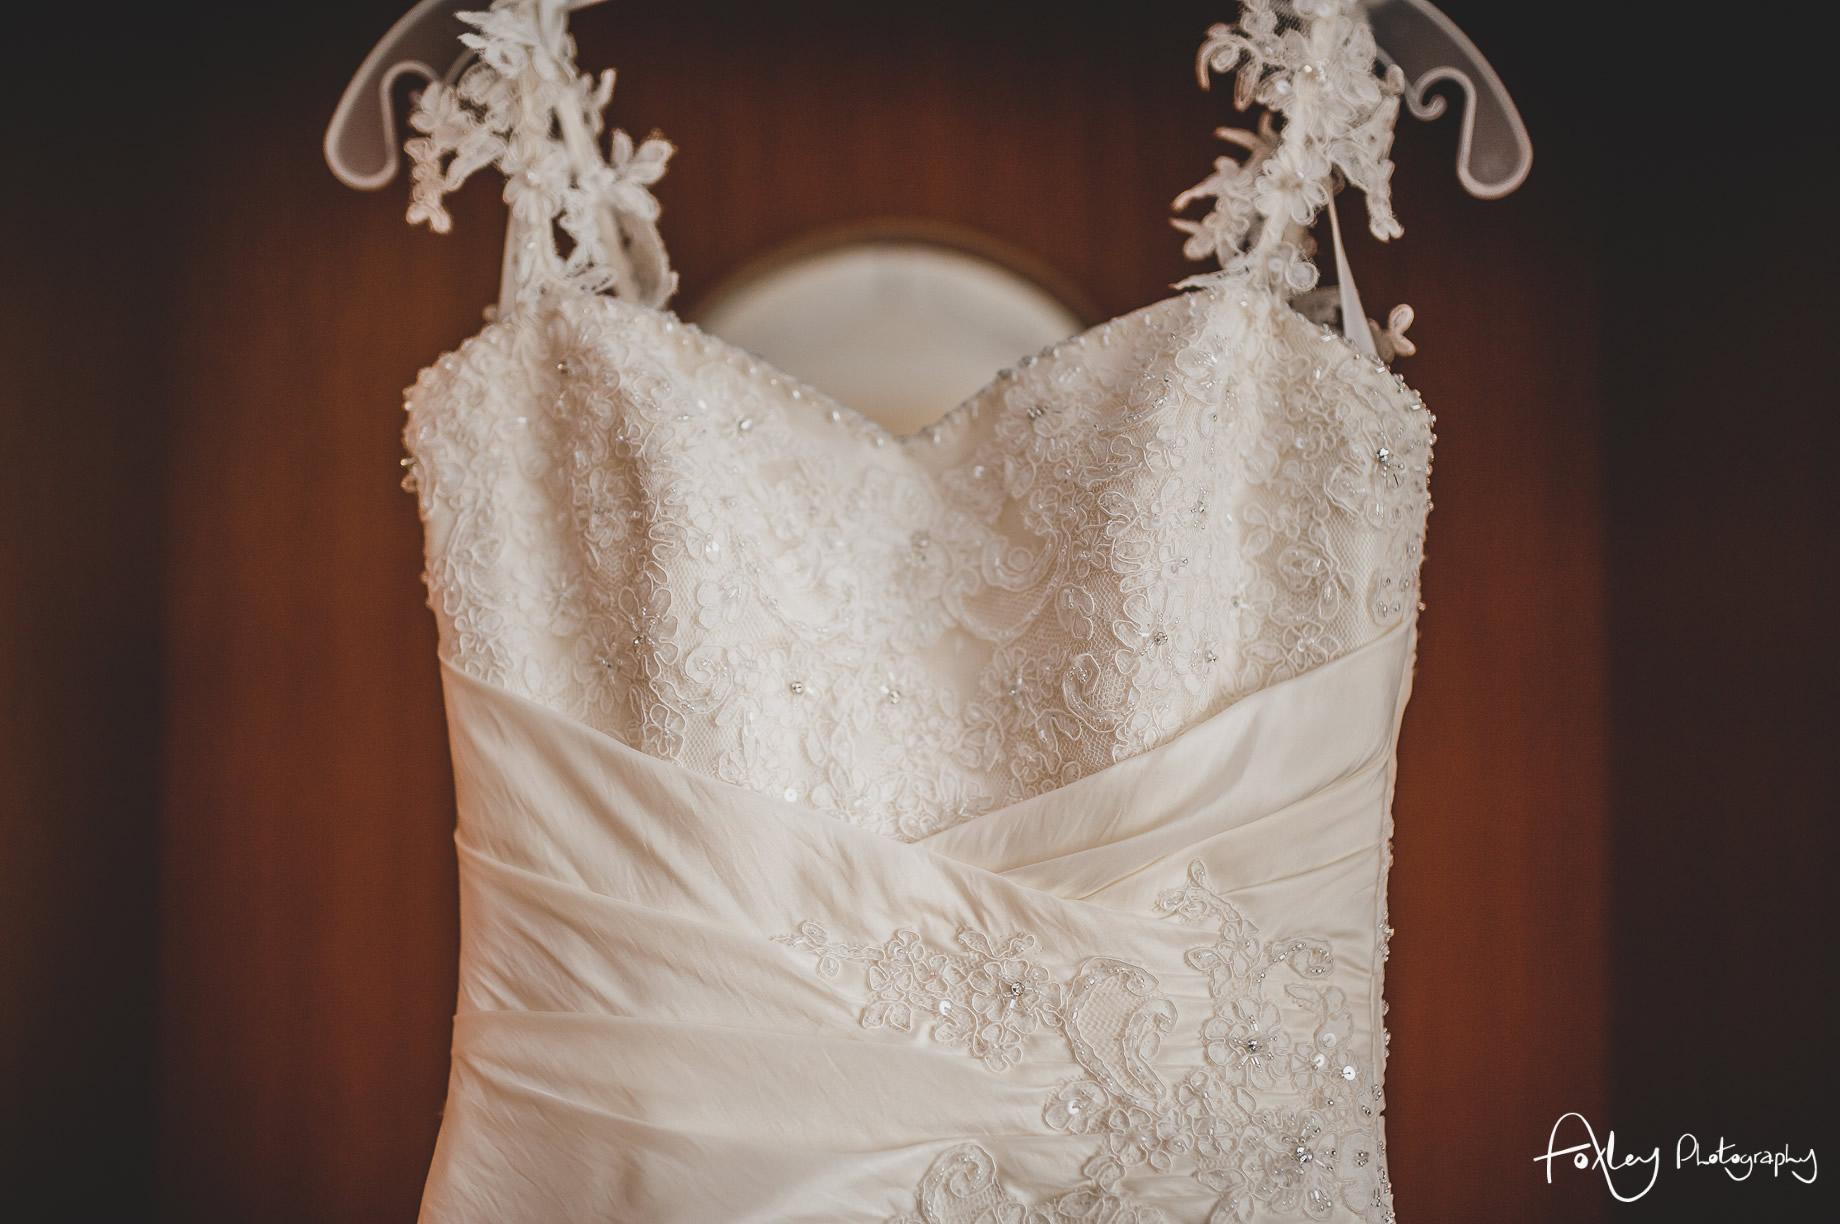 Gemma and Lewis' Wedding at Mitton Hall 001